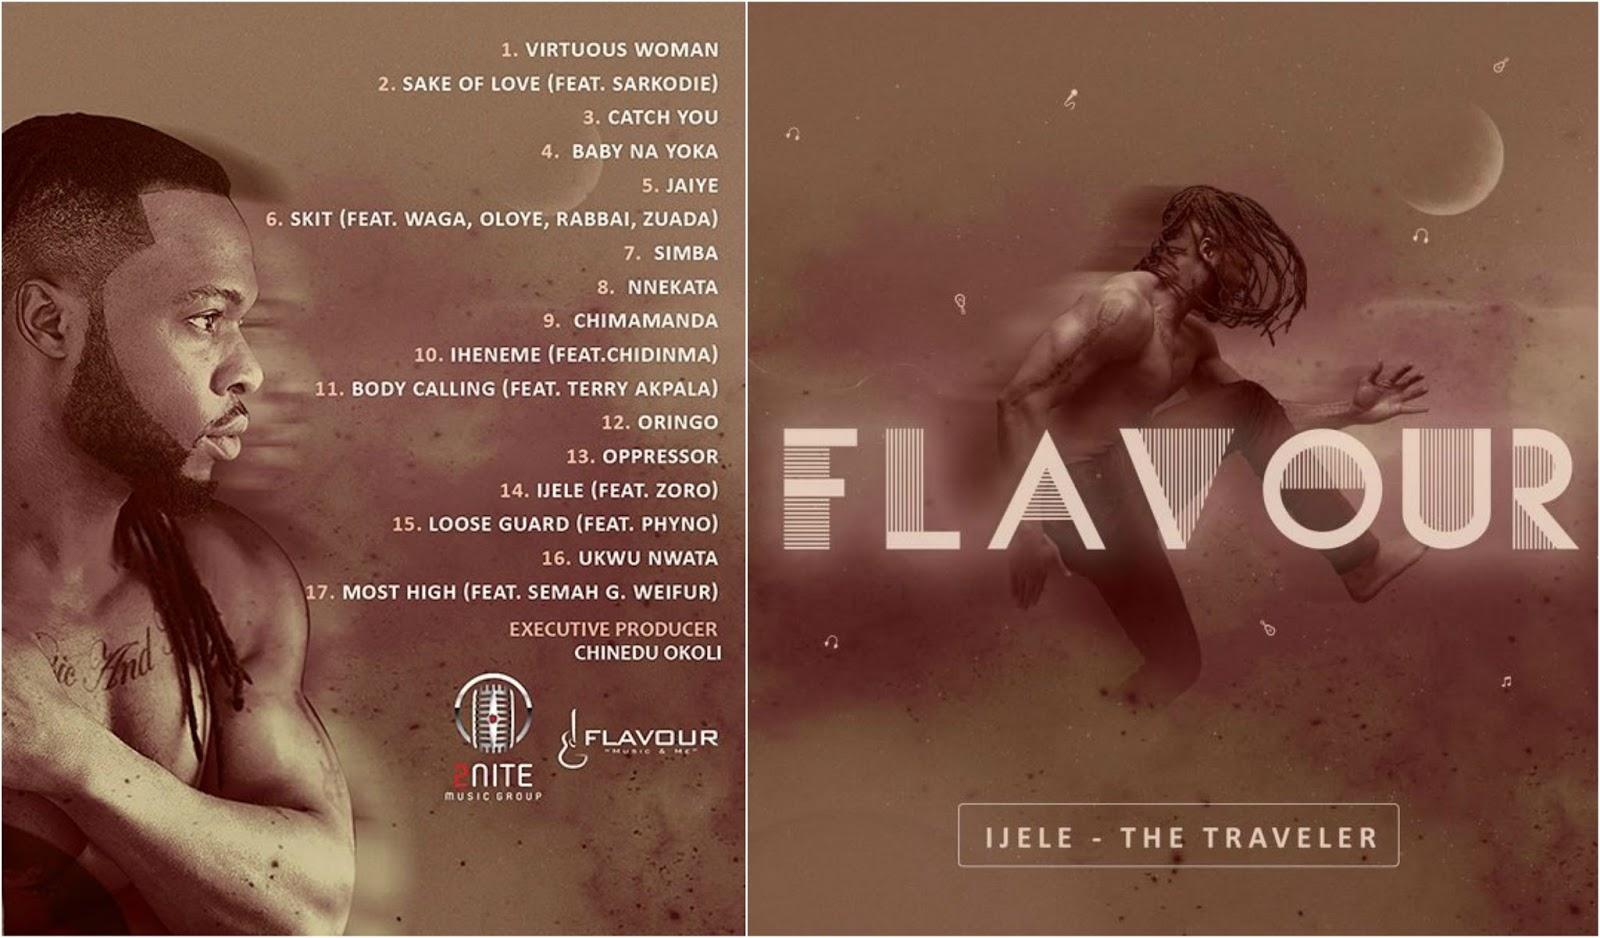 Flavour's 'Ijele The Traveler' Album Tracklist - Hit or Miss?